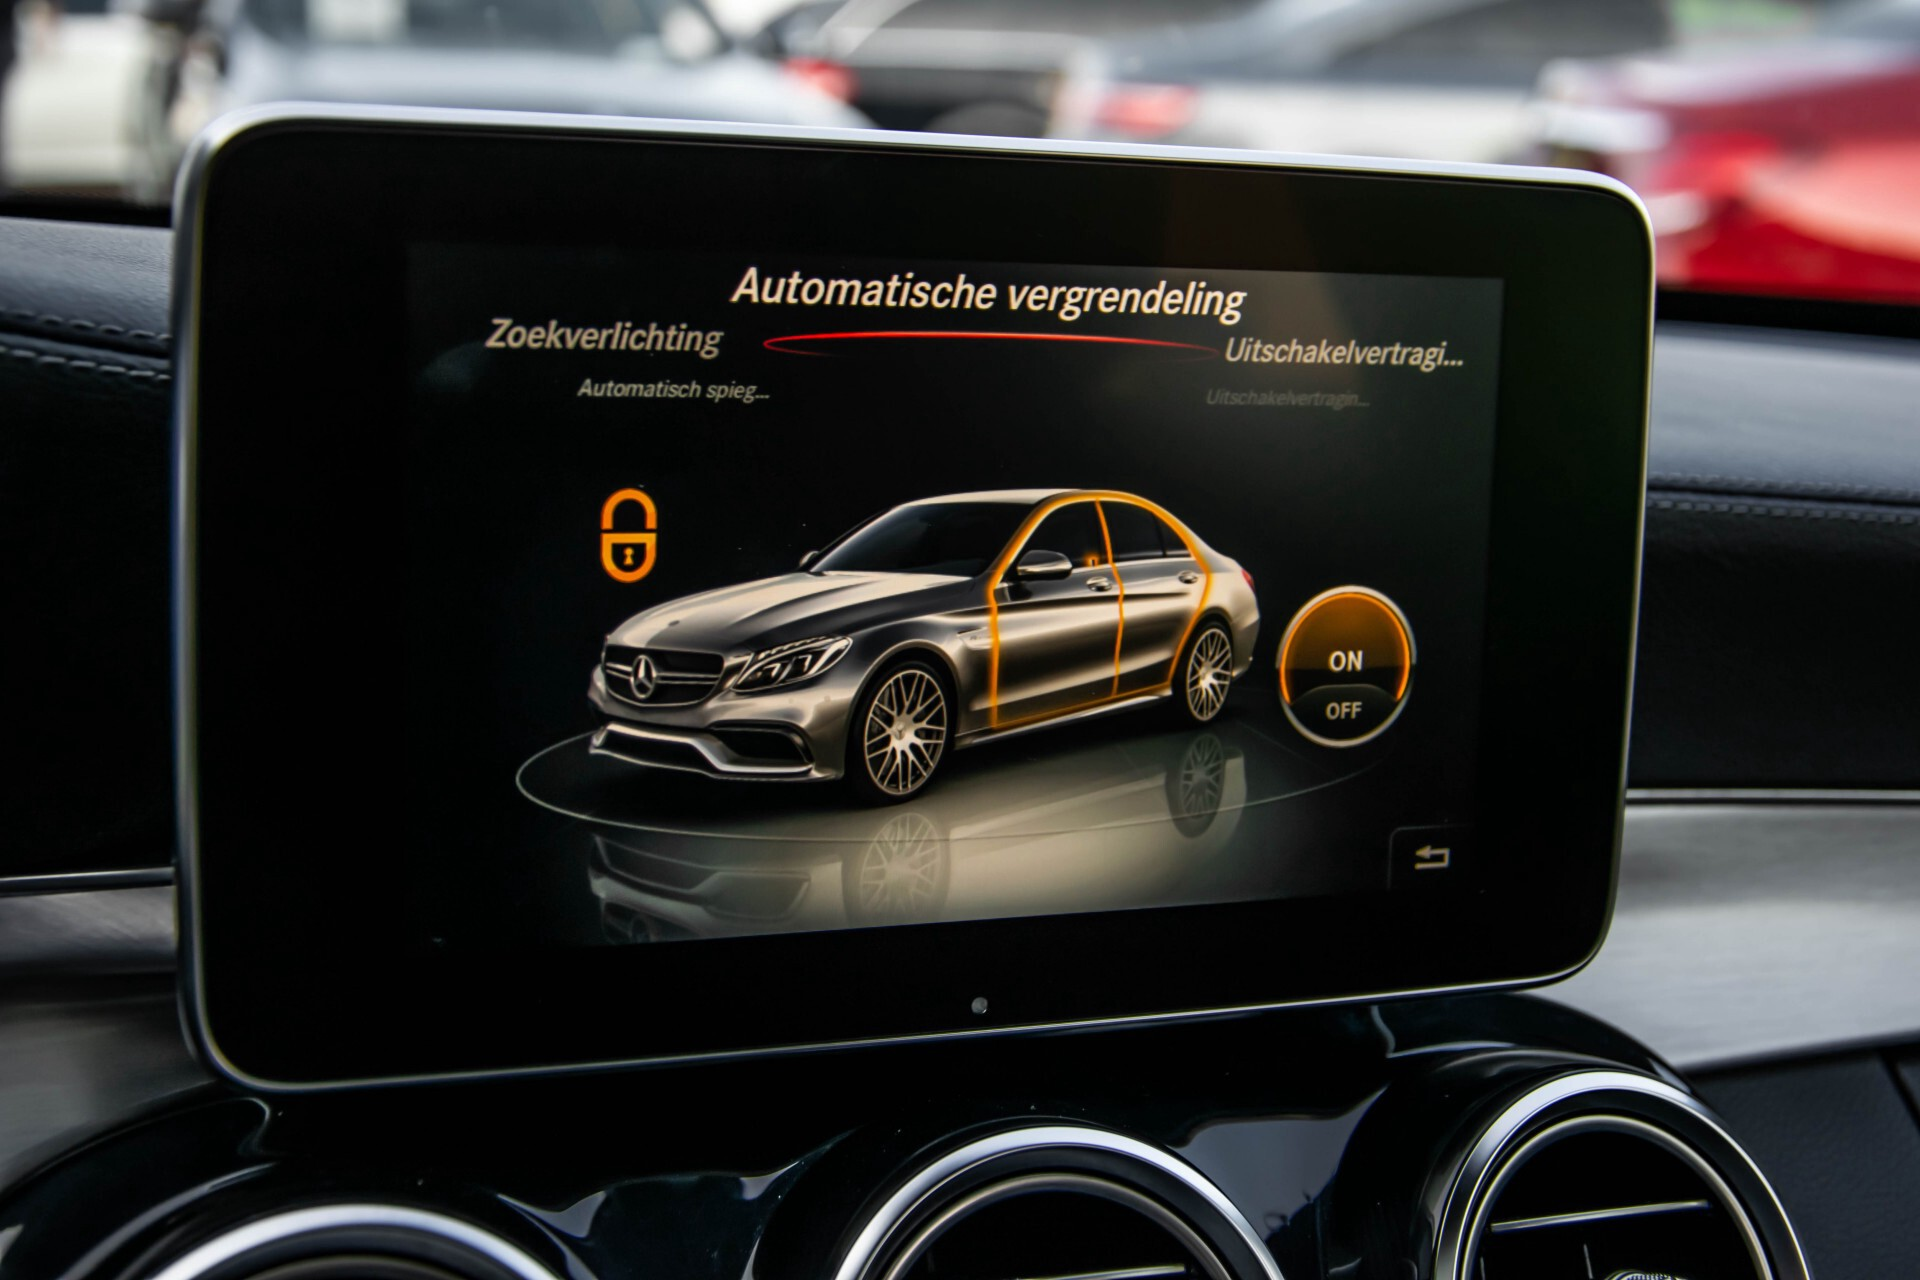 Mercedes-Benz C-Klasse 63 AMG S Panorama/Distronic/Keyless/Comand/Camera/ILS Aut7 Foto 37